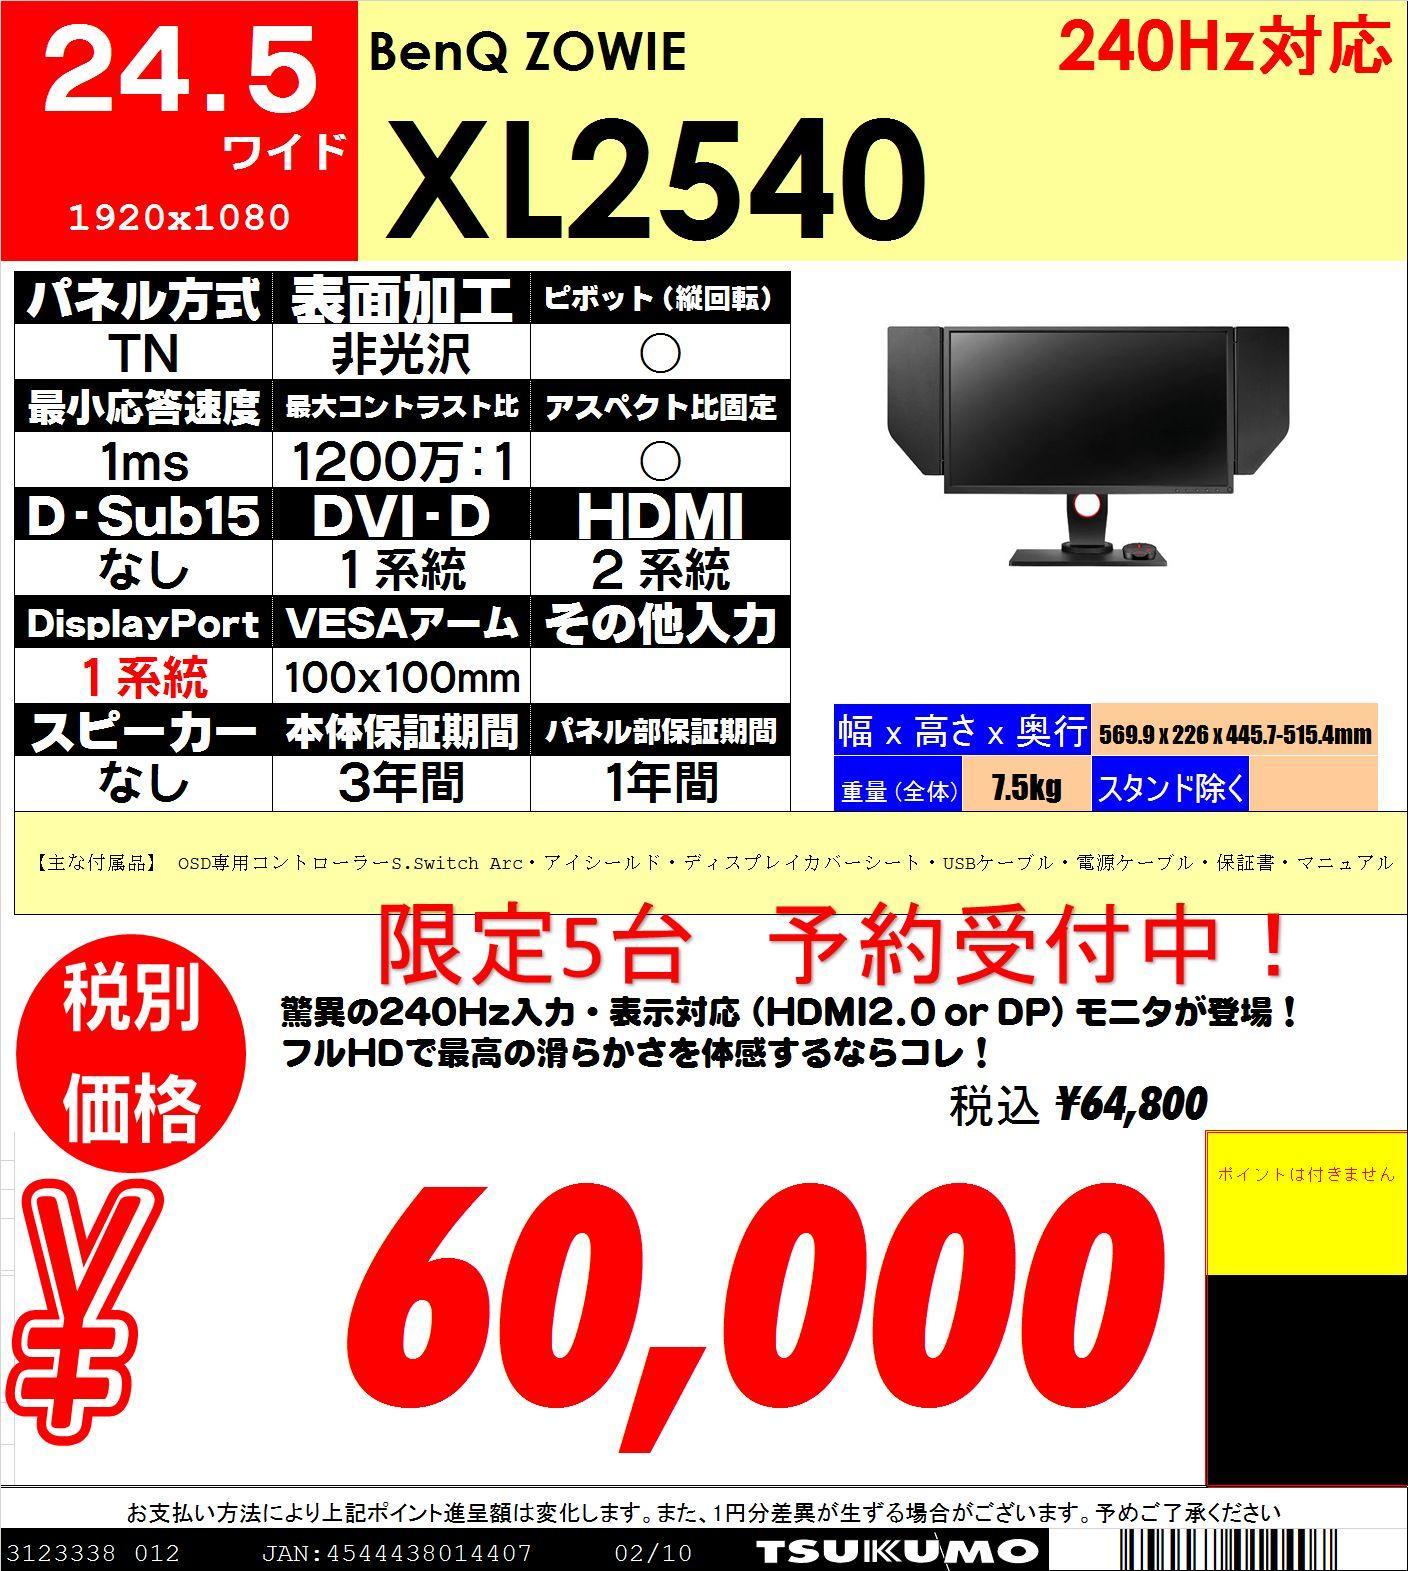 XL2540_Preorder.jpg